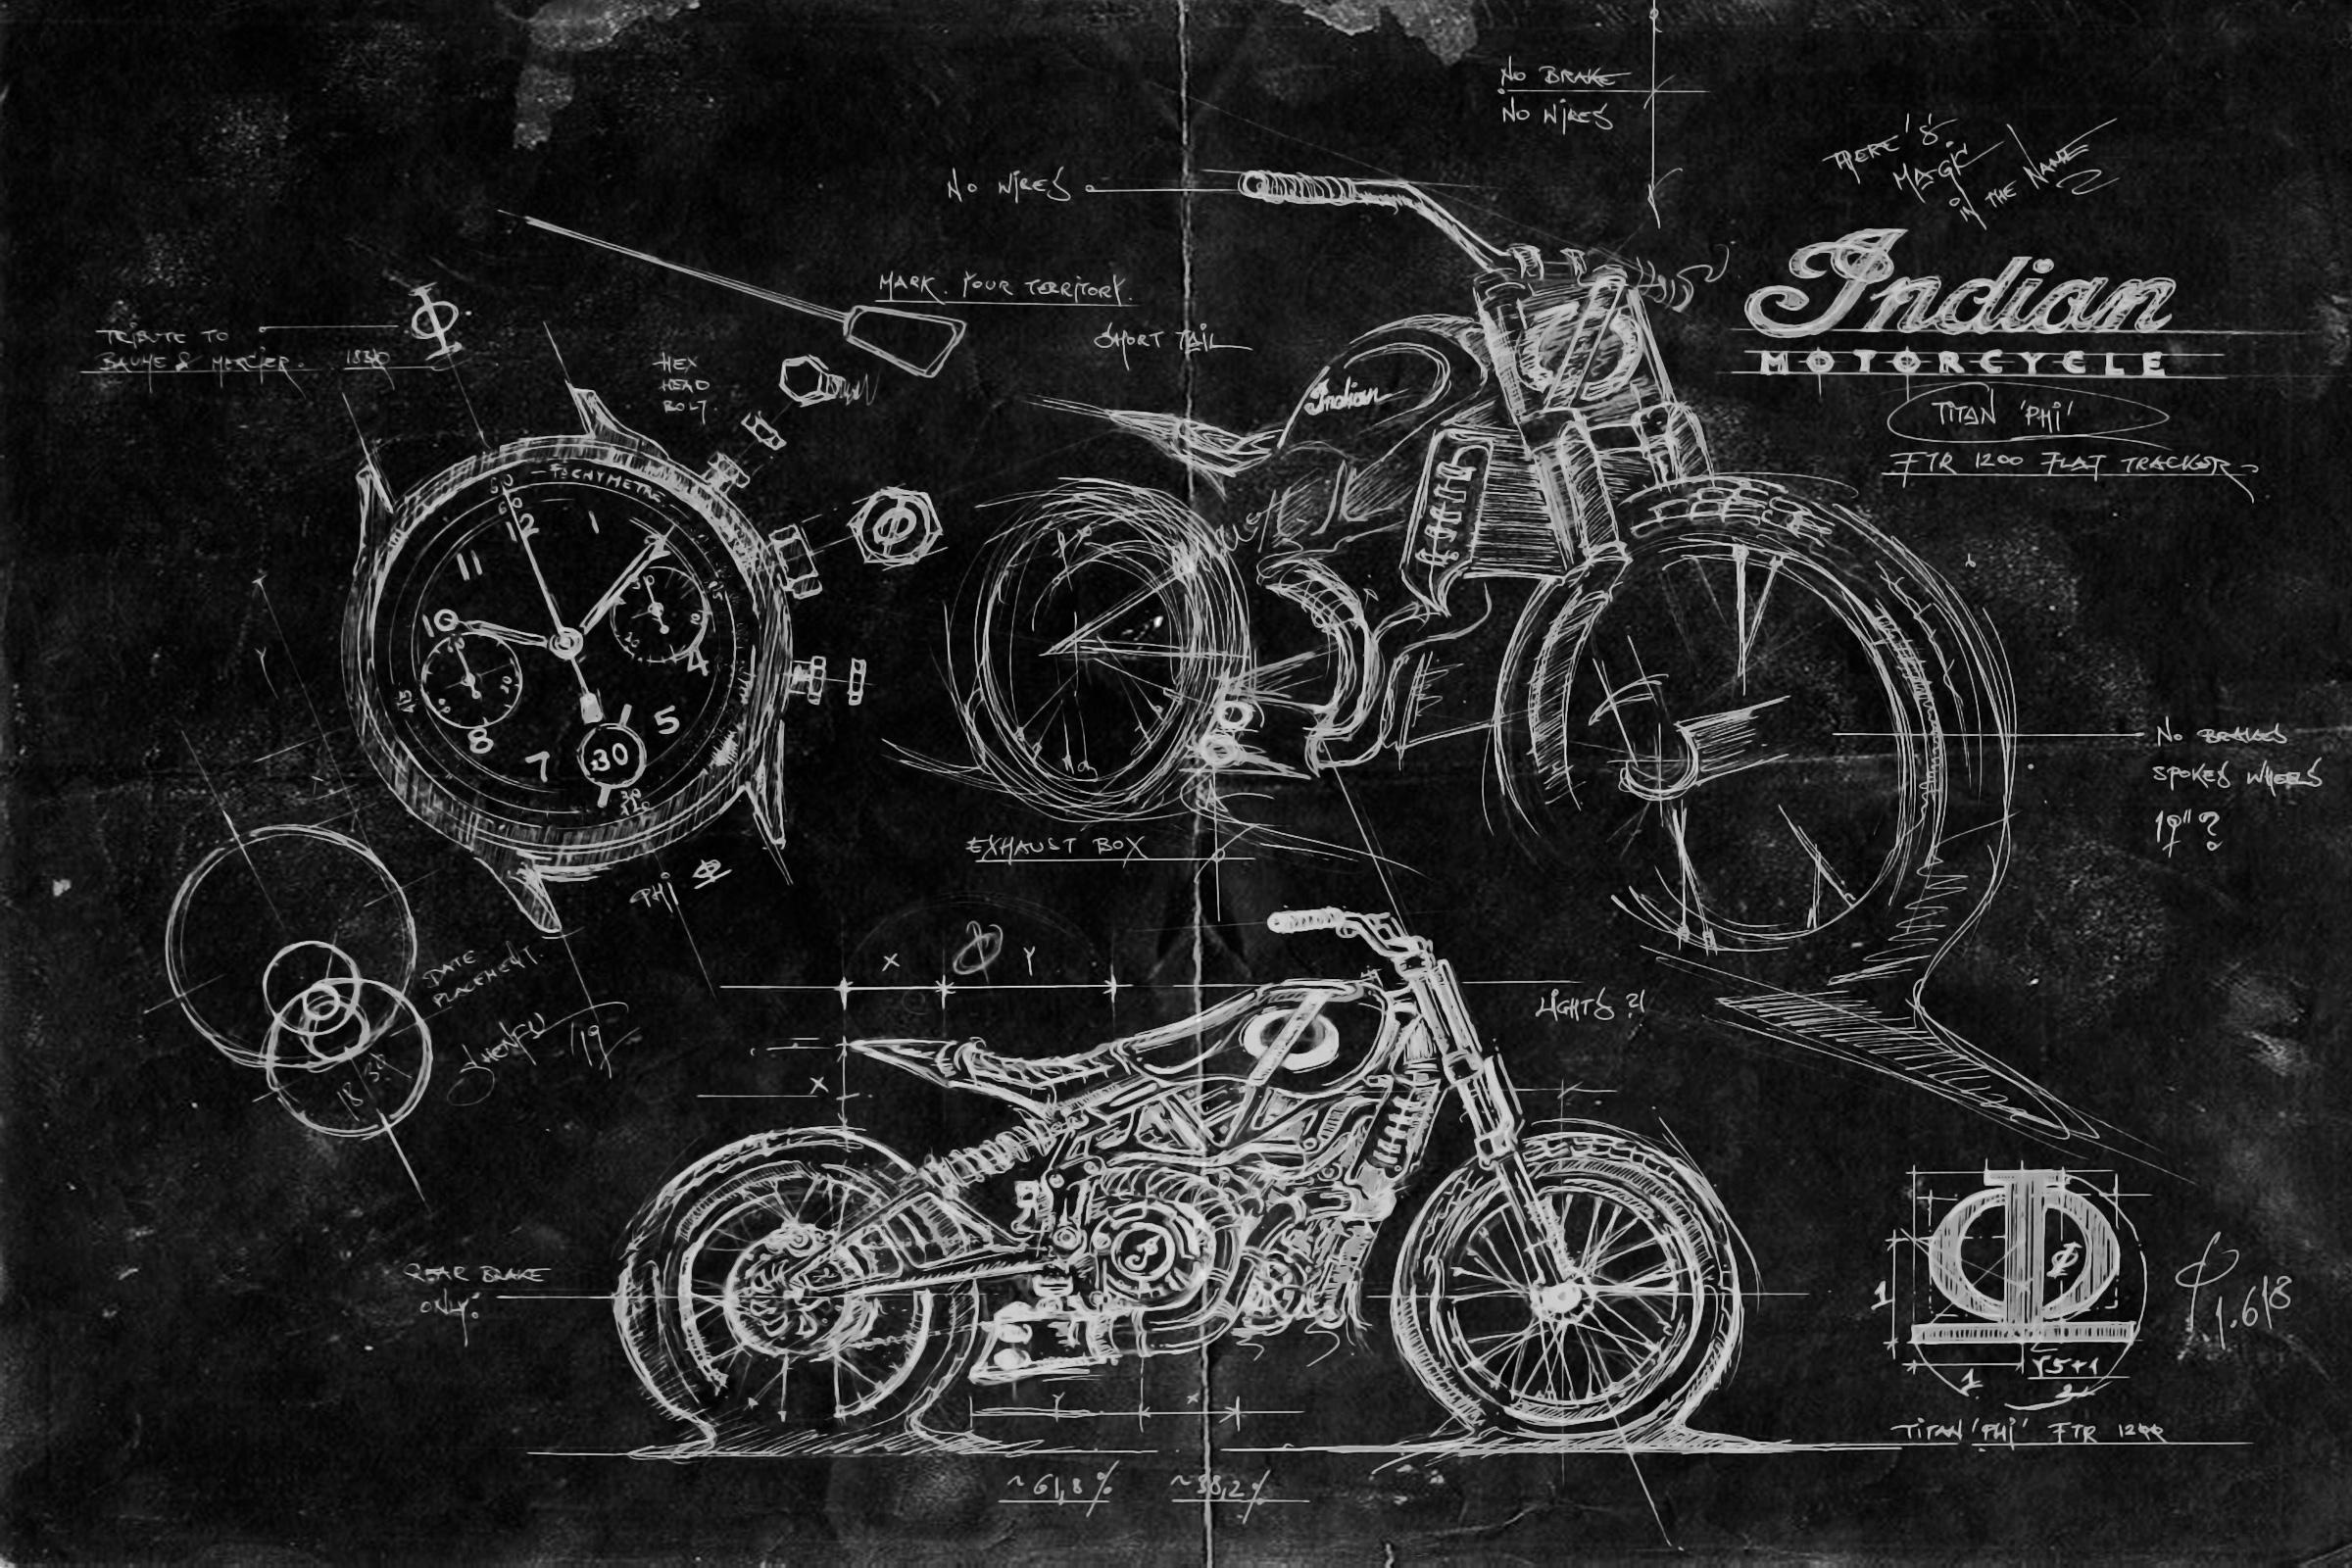 TITAN-Phi-A-Tribute-to-Craftmanship-Custom-Art-and-Design-SHENFU-Graz-Illustration-Cafe-Racer-Concept